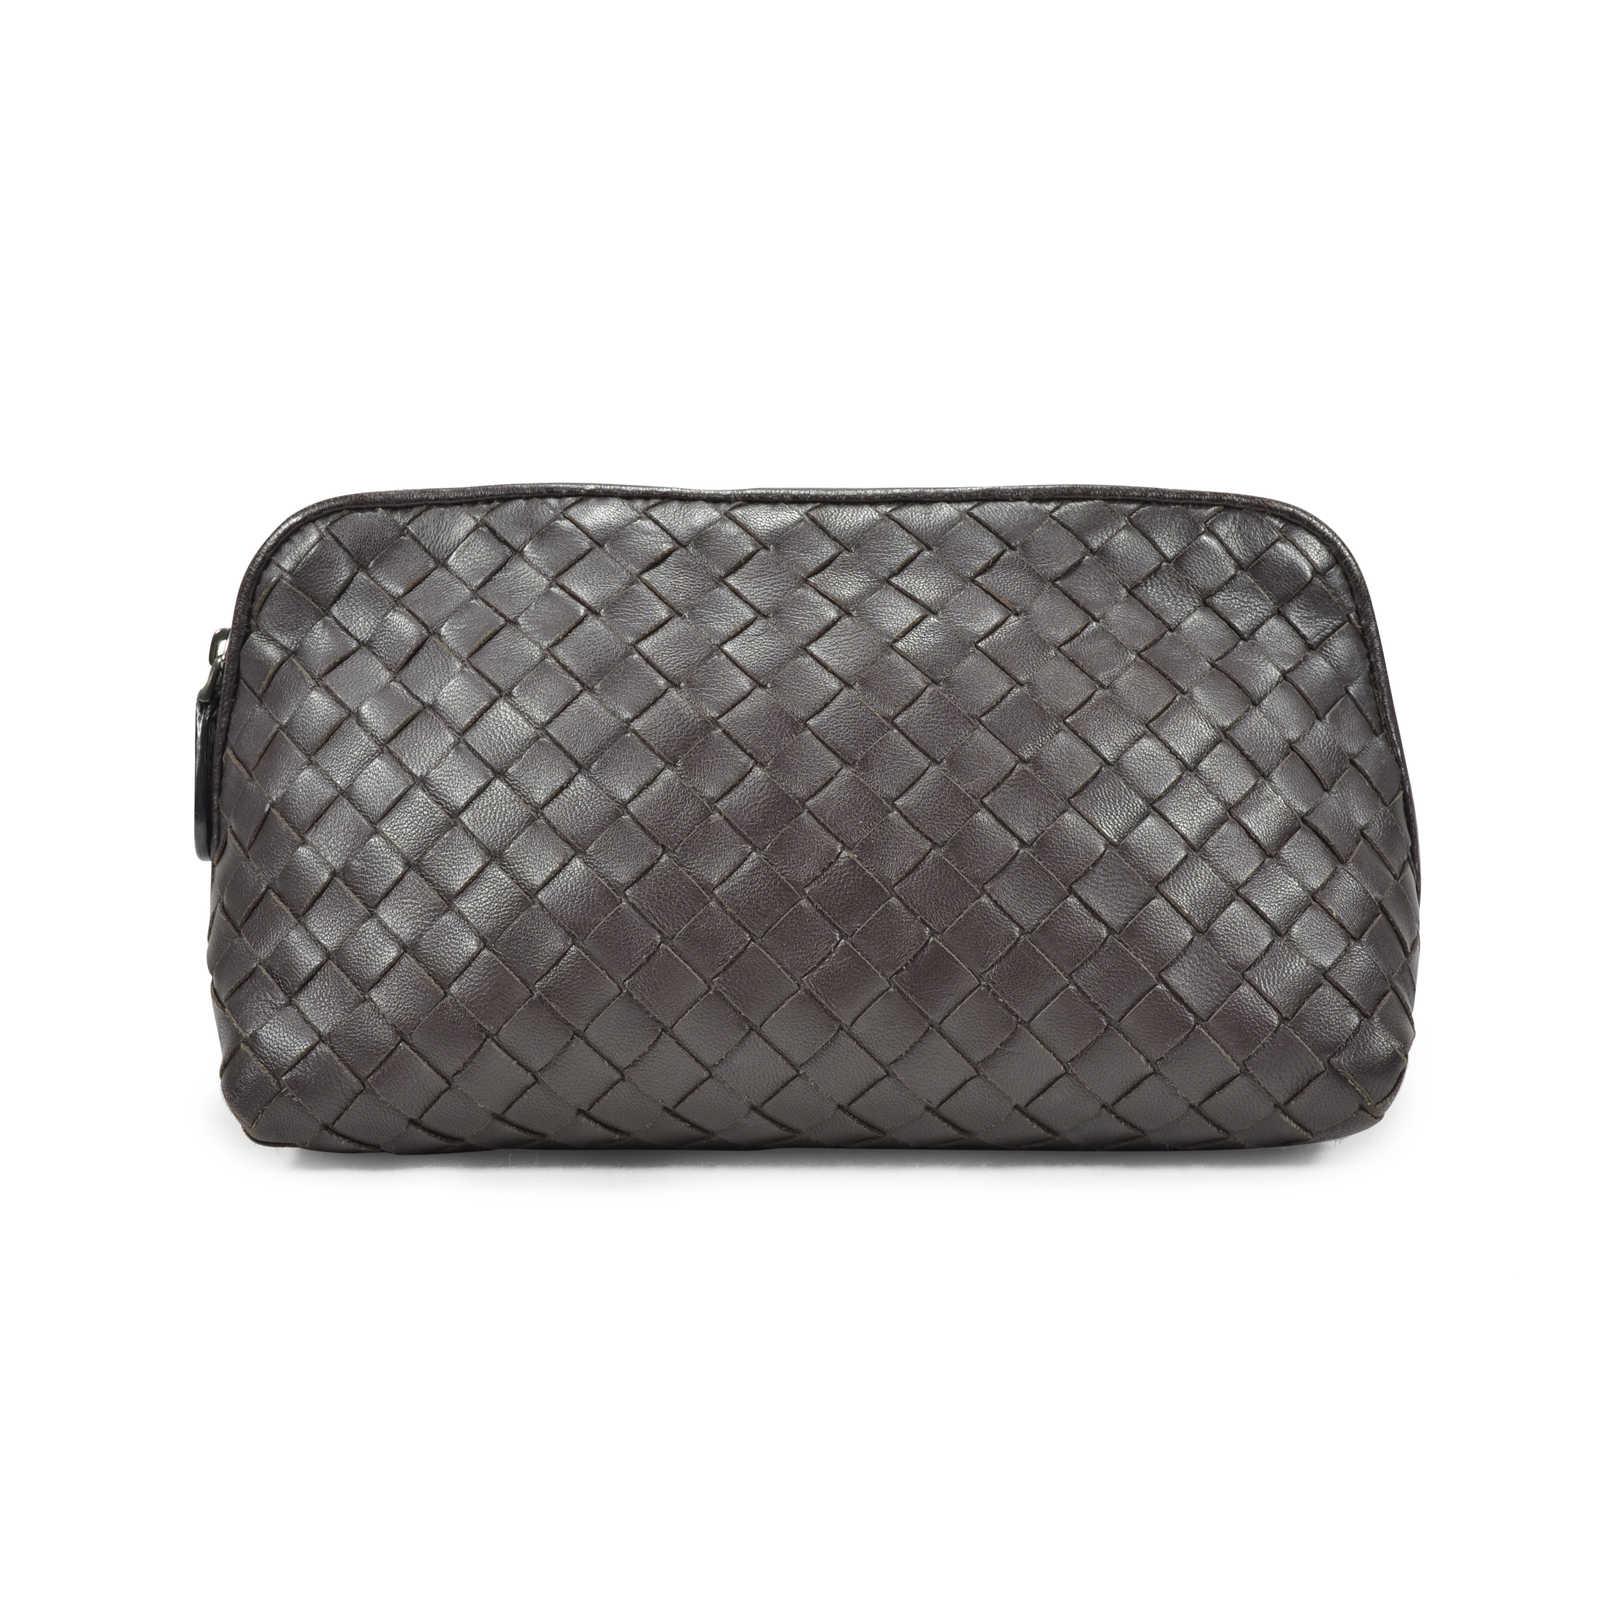 65fd9d5496a9 Authentic Second Hand Bottega Veneta Cosmetic Case (PSS-350-00017) -  Thumbnail ...